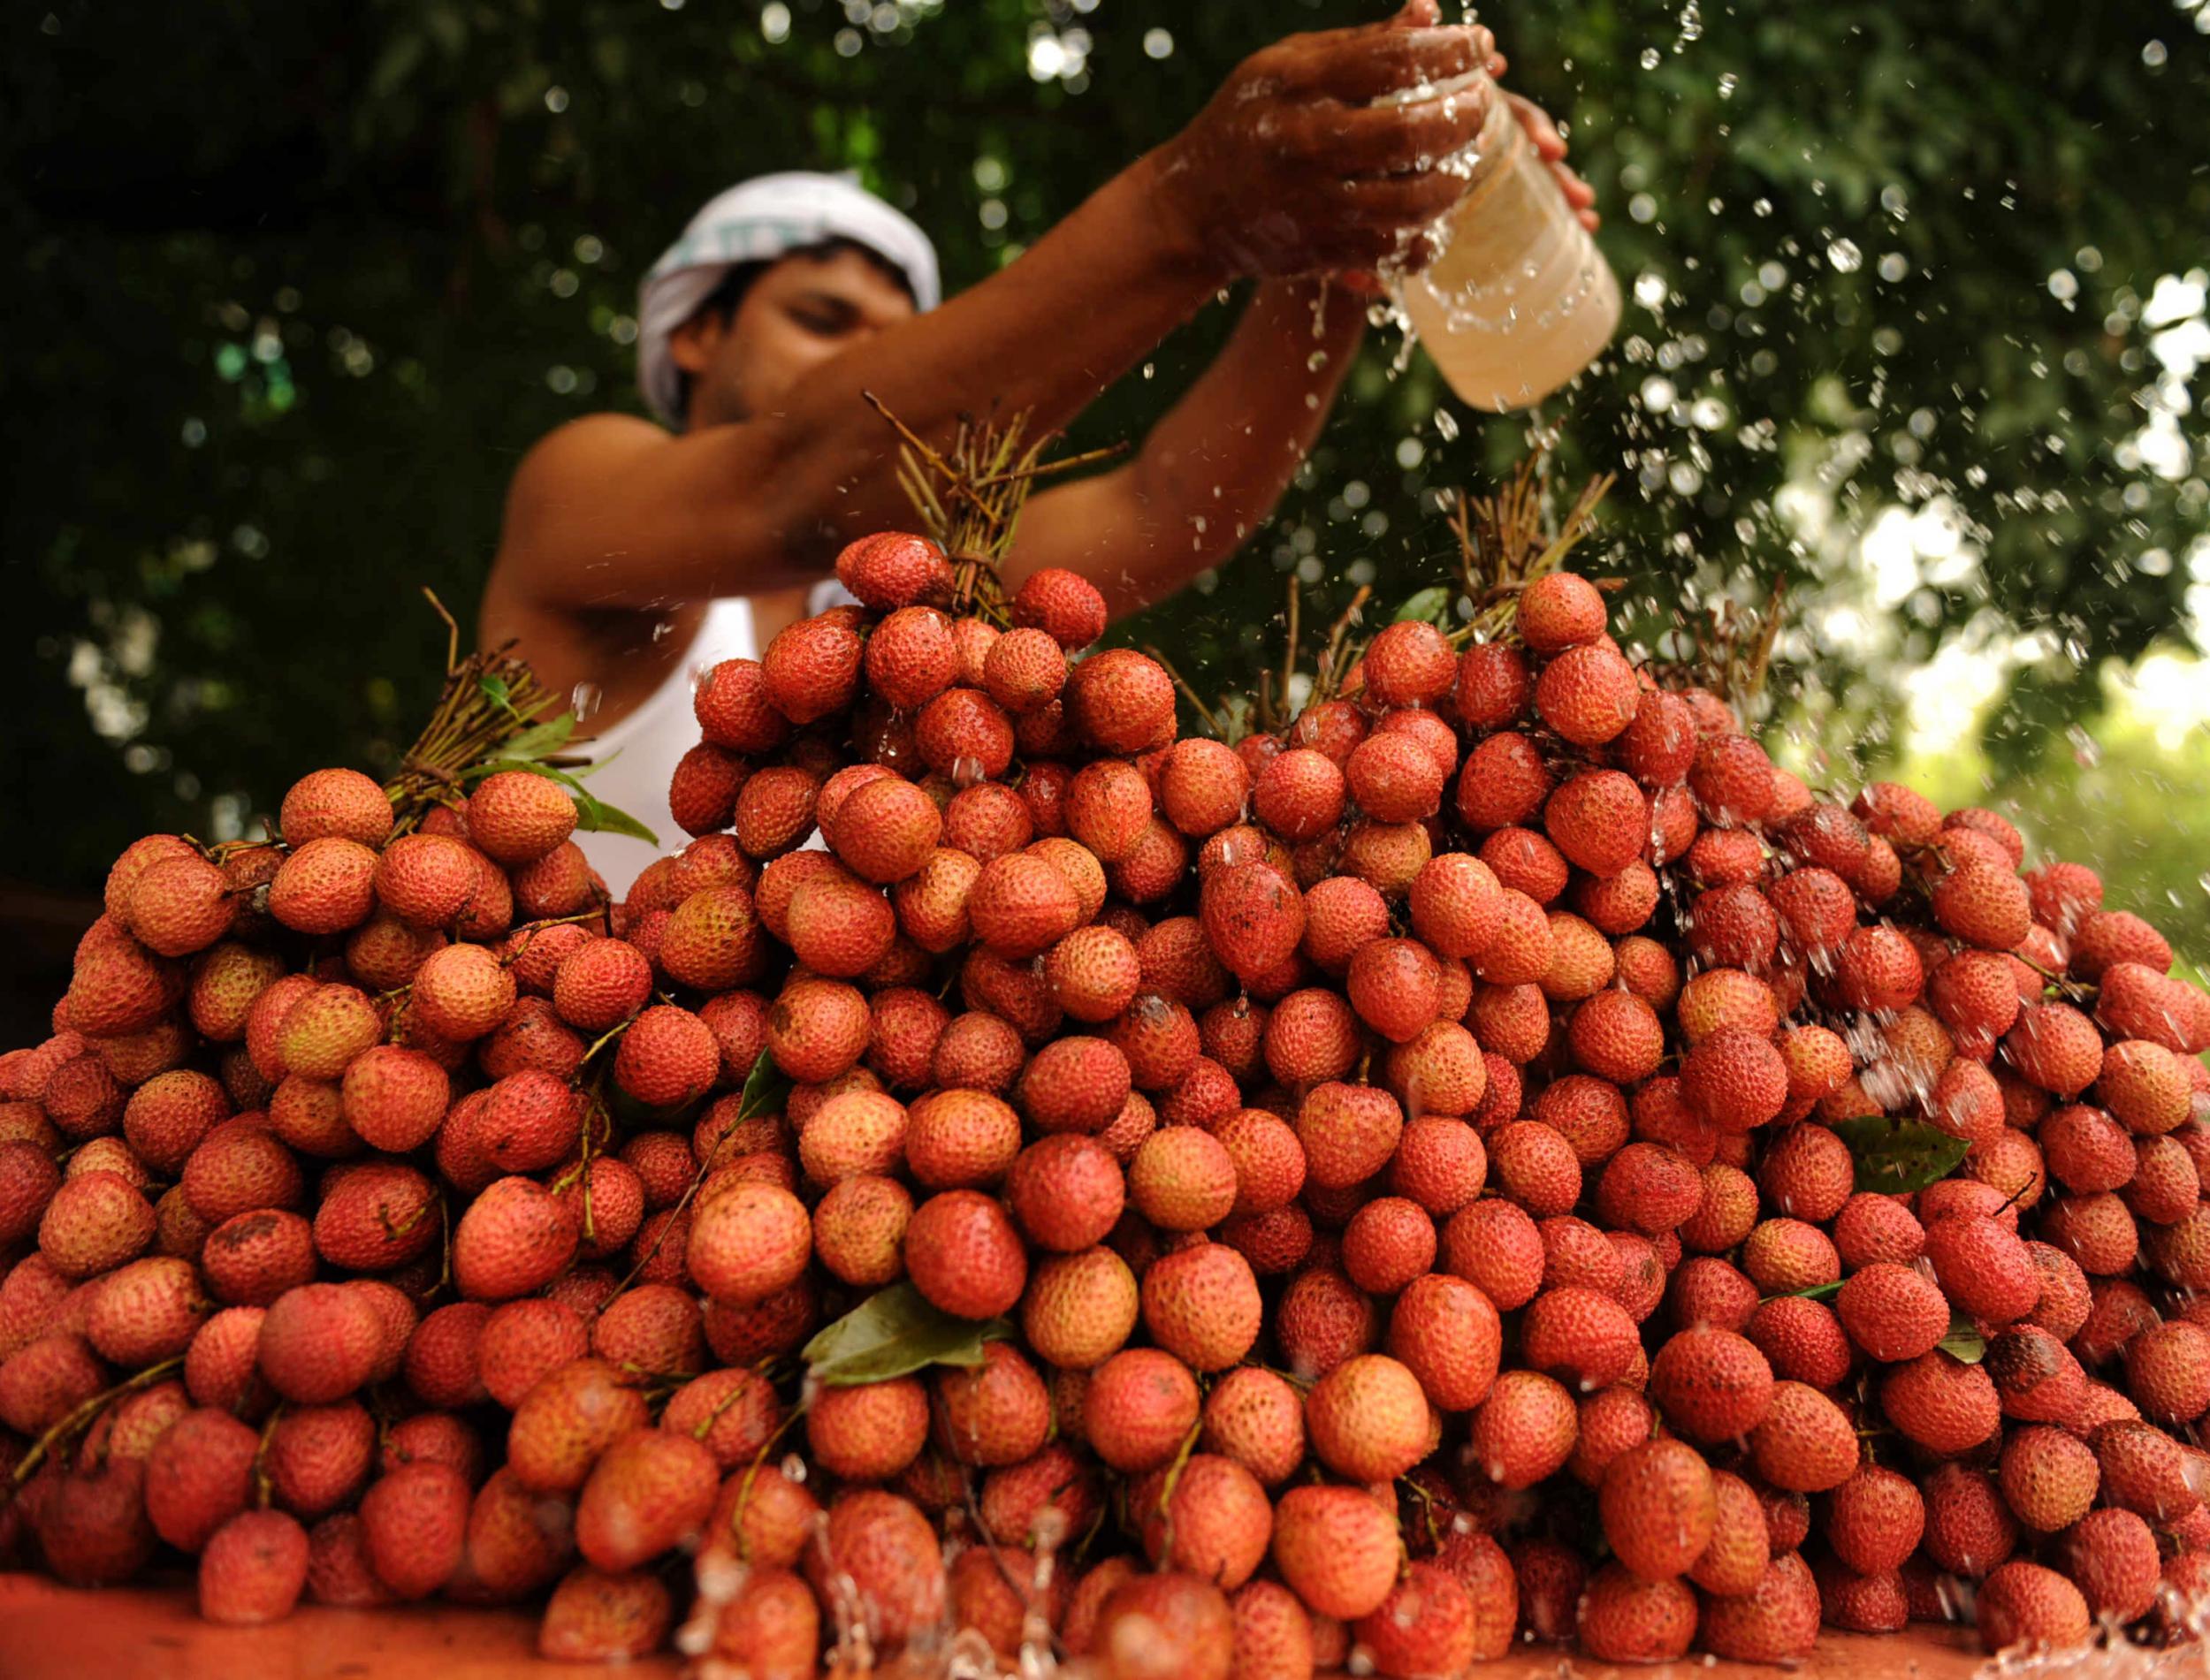 India: 43 children dead in brain disease outbreak 'linked to lychee fruit toxin'